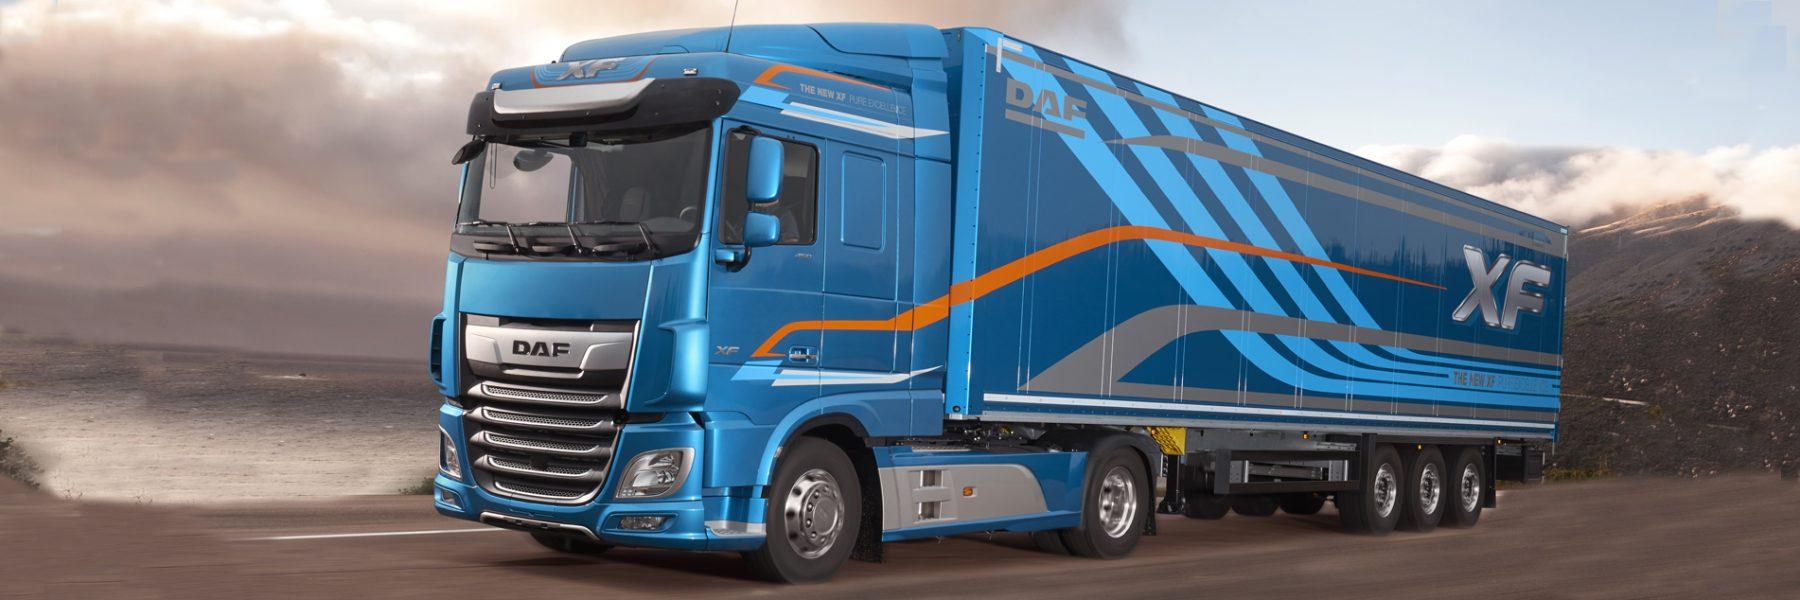 Daf Truck 2018